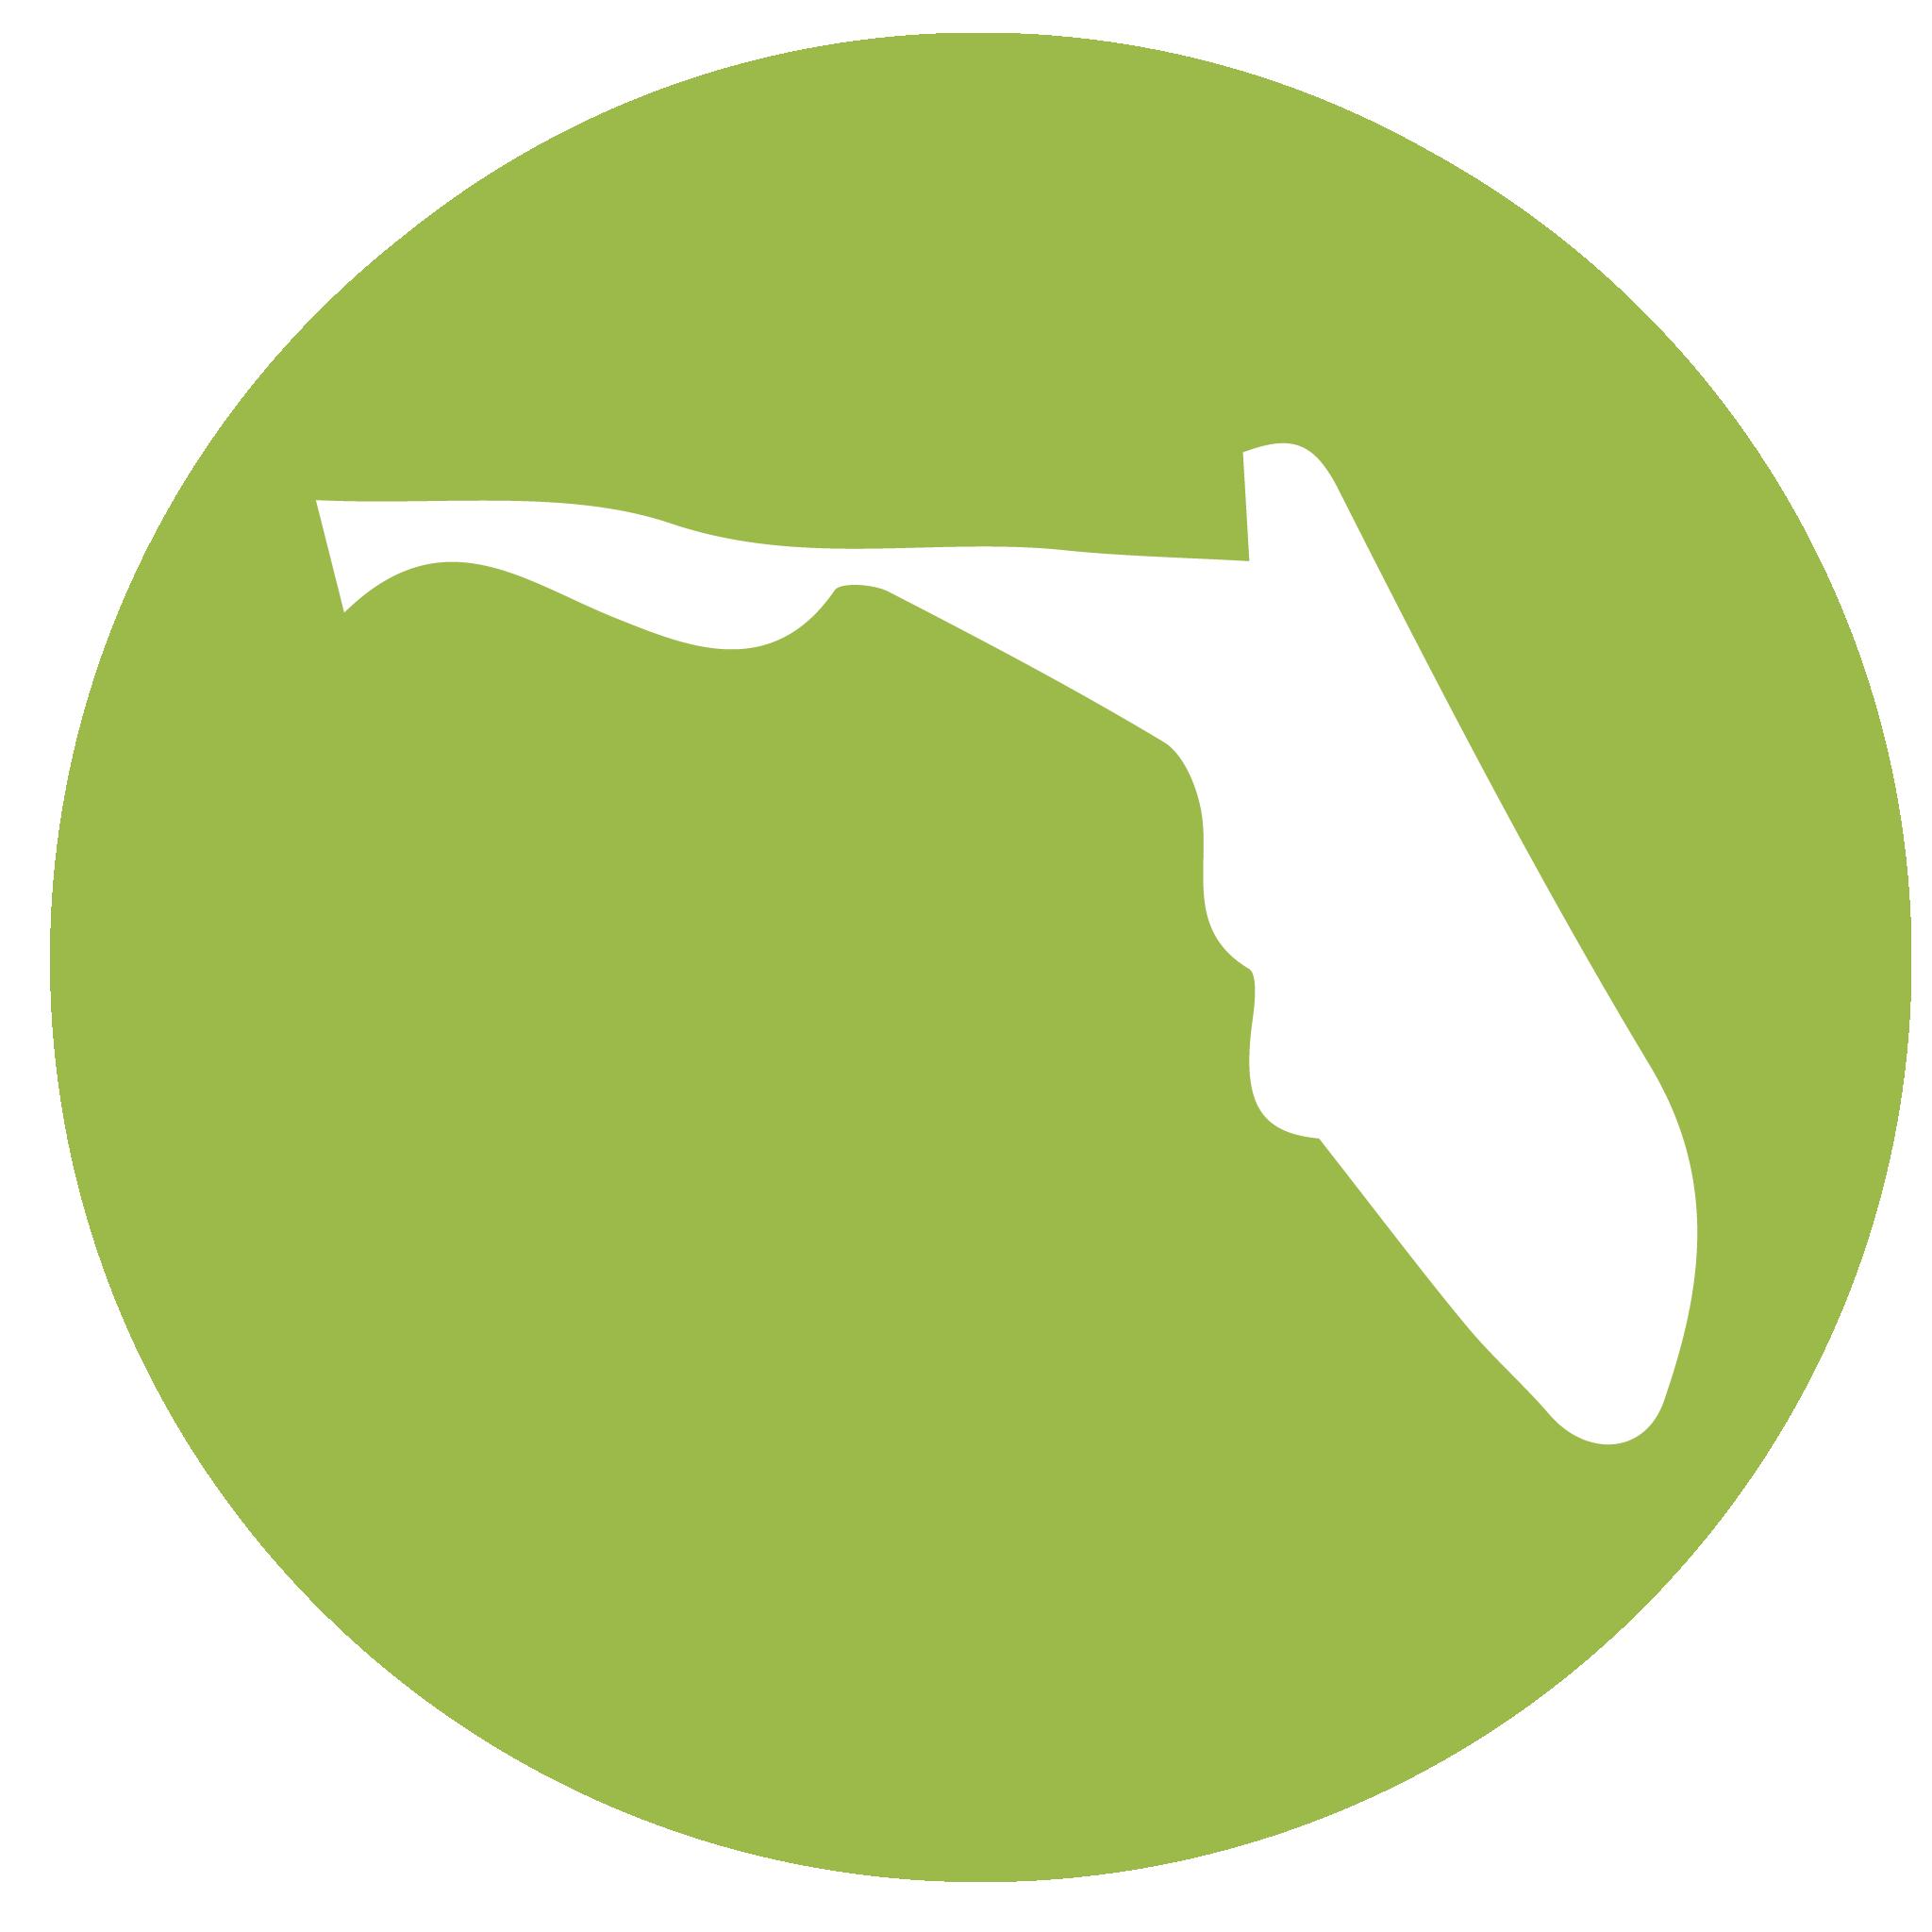 Bay beacon niceville logo clipart vector download Edudata Portal vector download